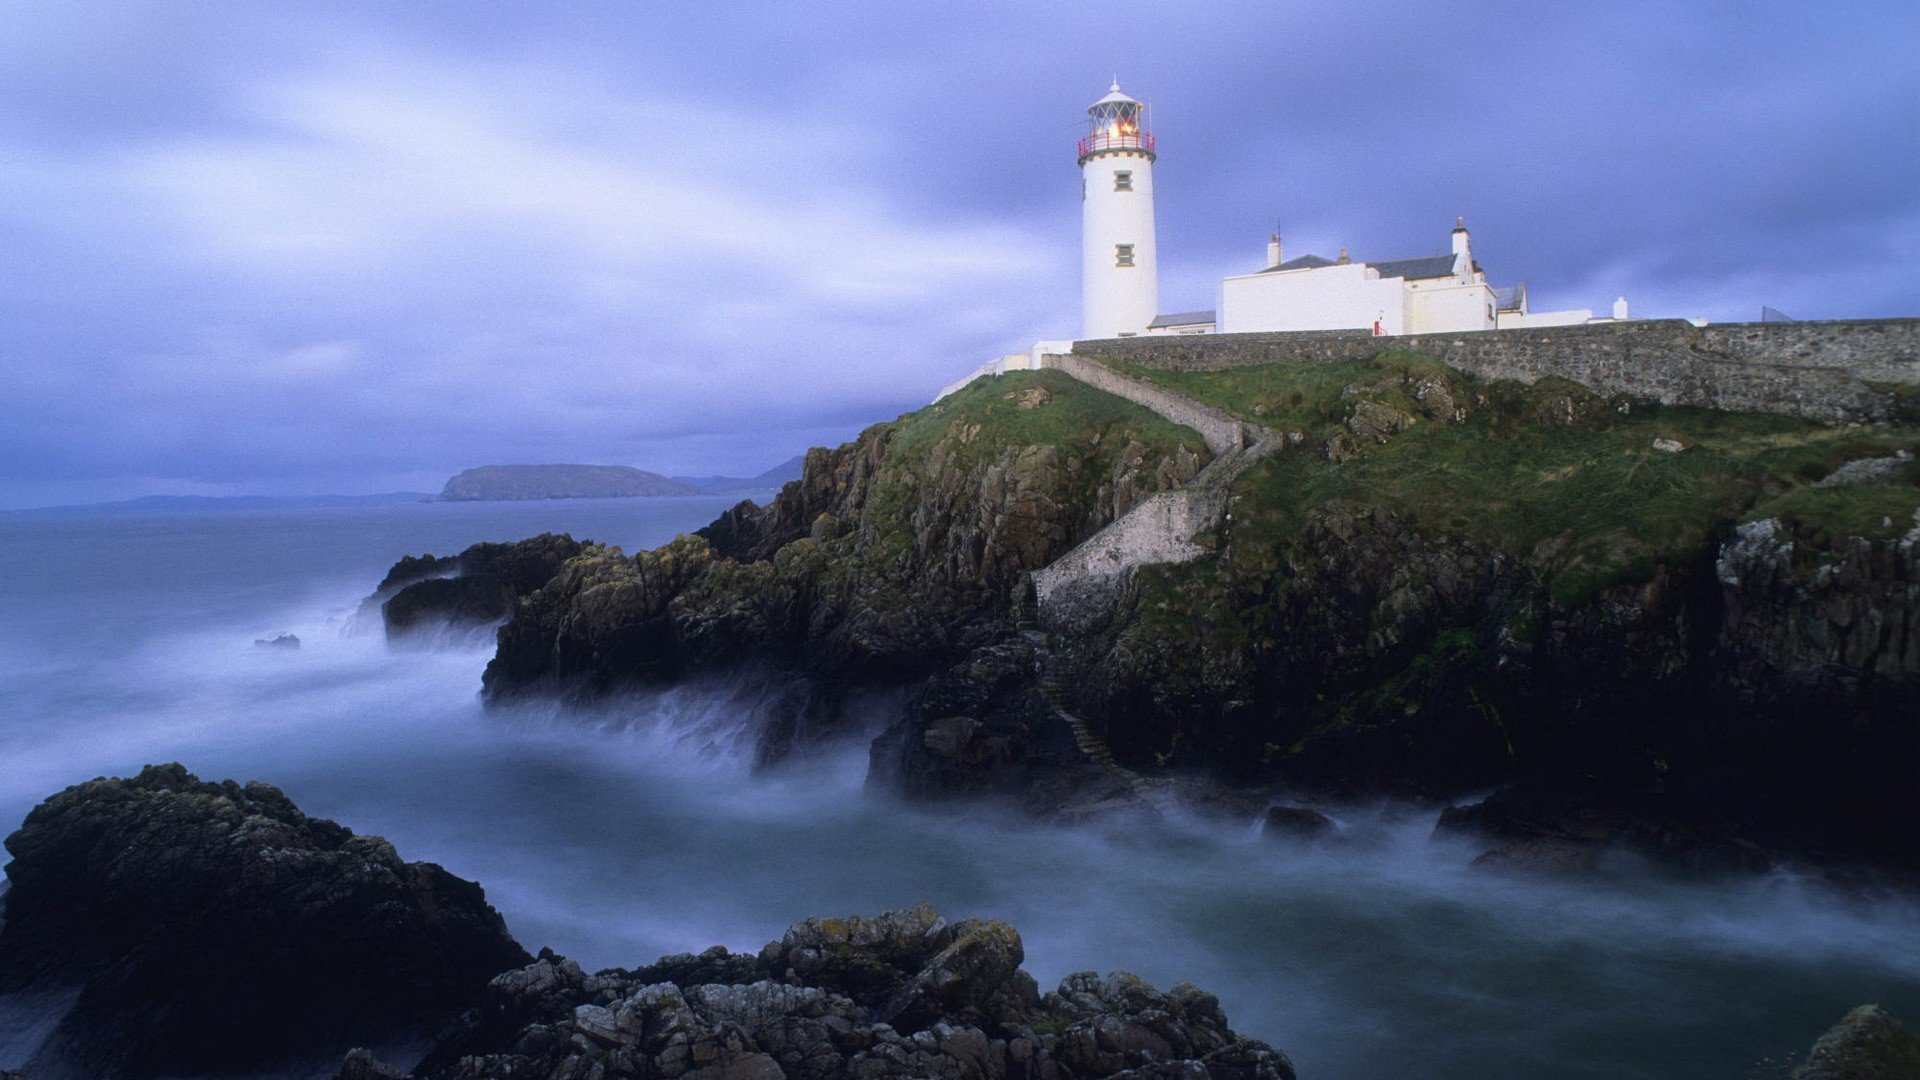 Landscapes head Ireland lighthouses wallpaper 1920x1080 237110 1920x1080